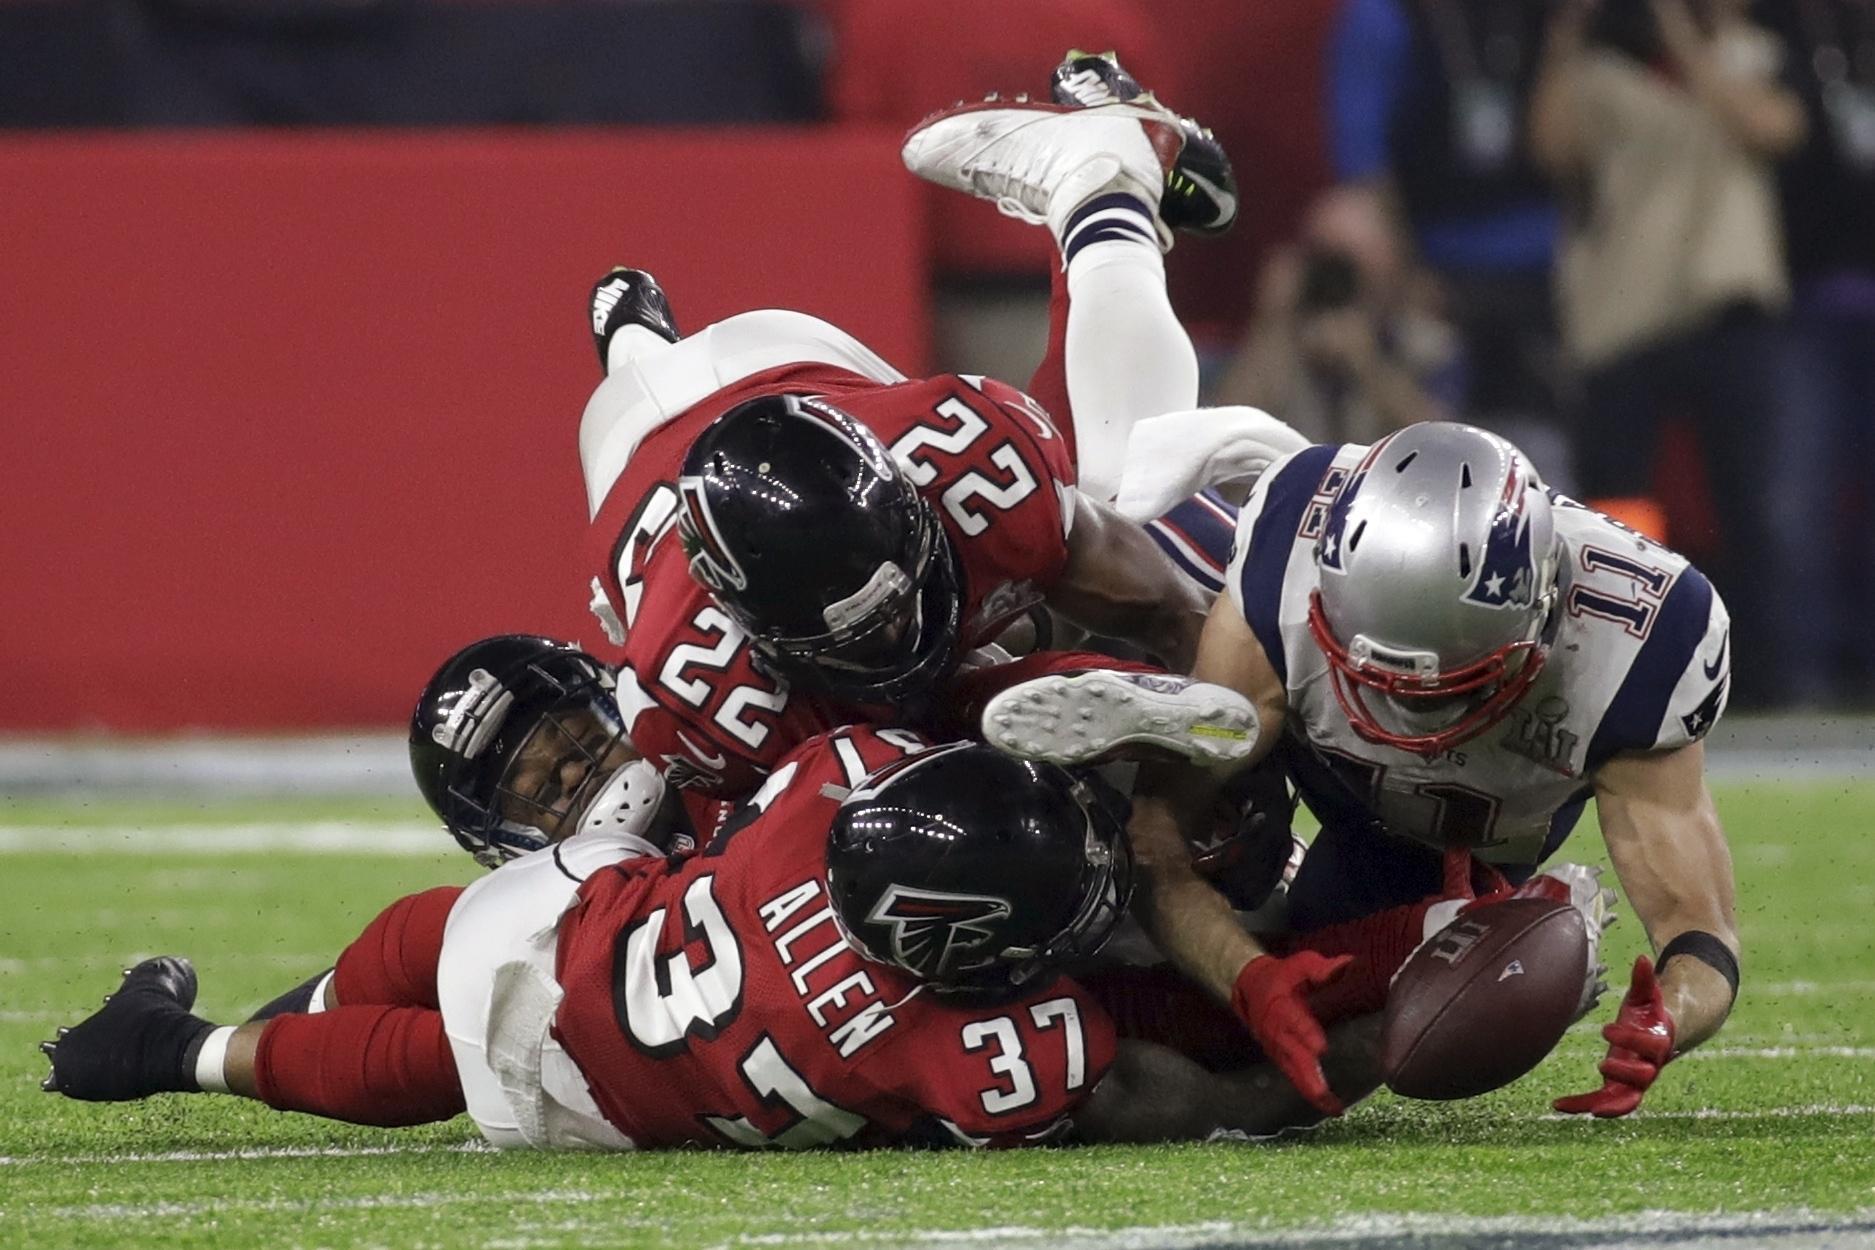 Atlanta lost a heart-breaking Super Bowl against New England last year